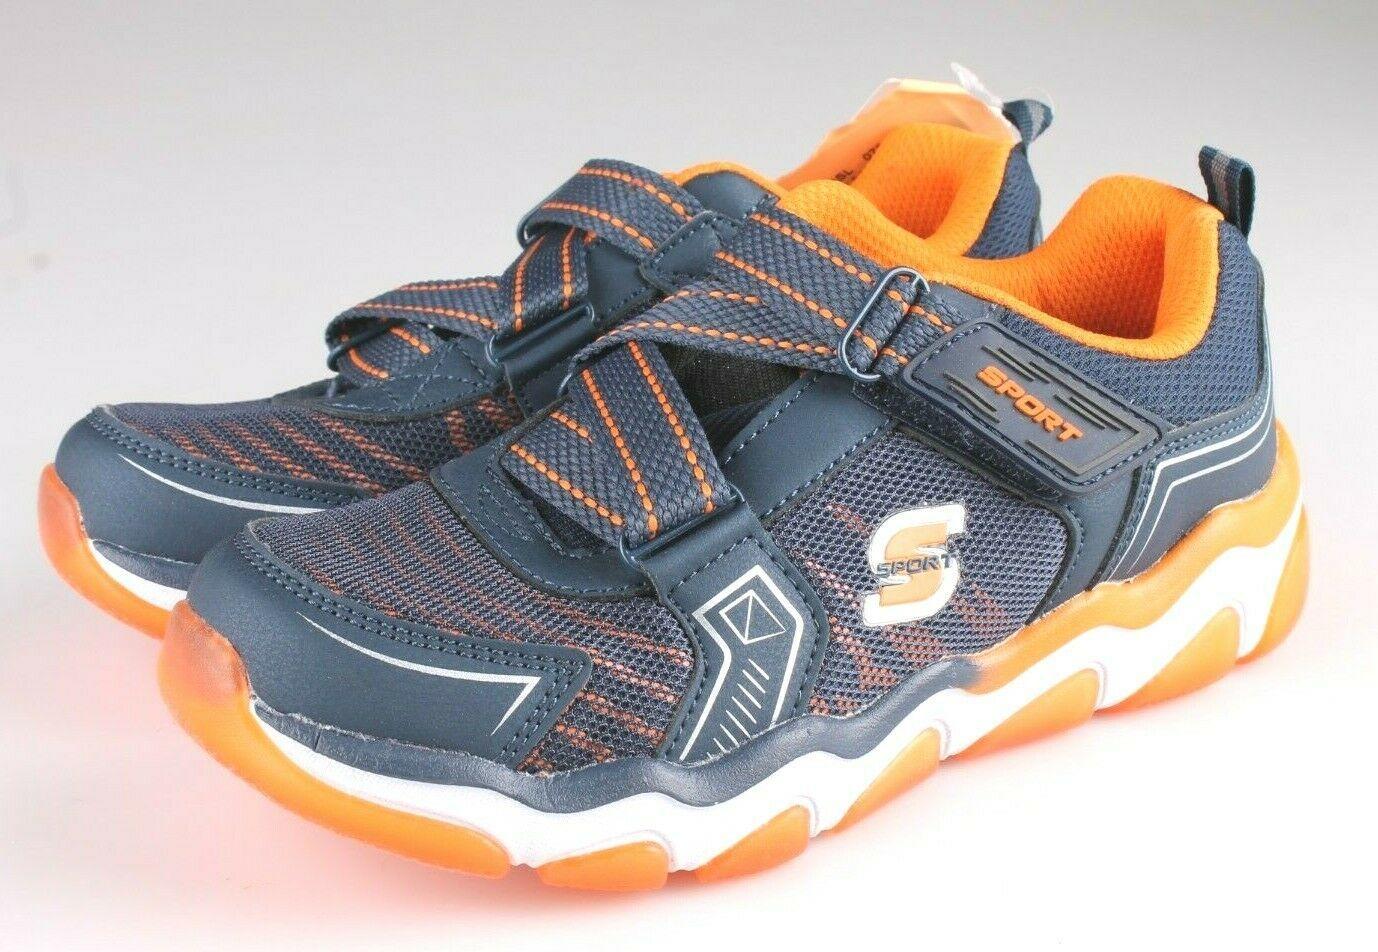 Skechers Boys S Sport blue orange Orin Hook & Loop Slip-on Sneaker Shoes 2 NWT